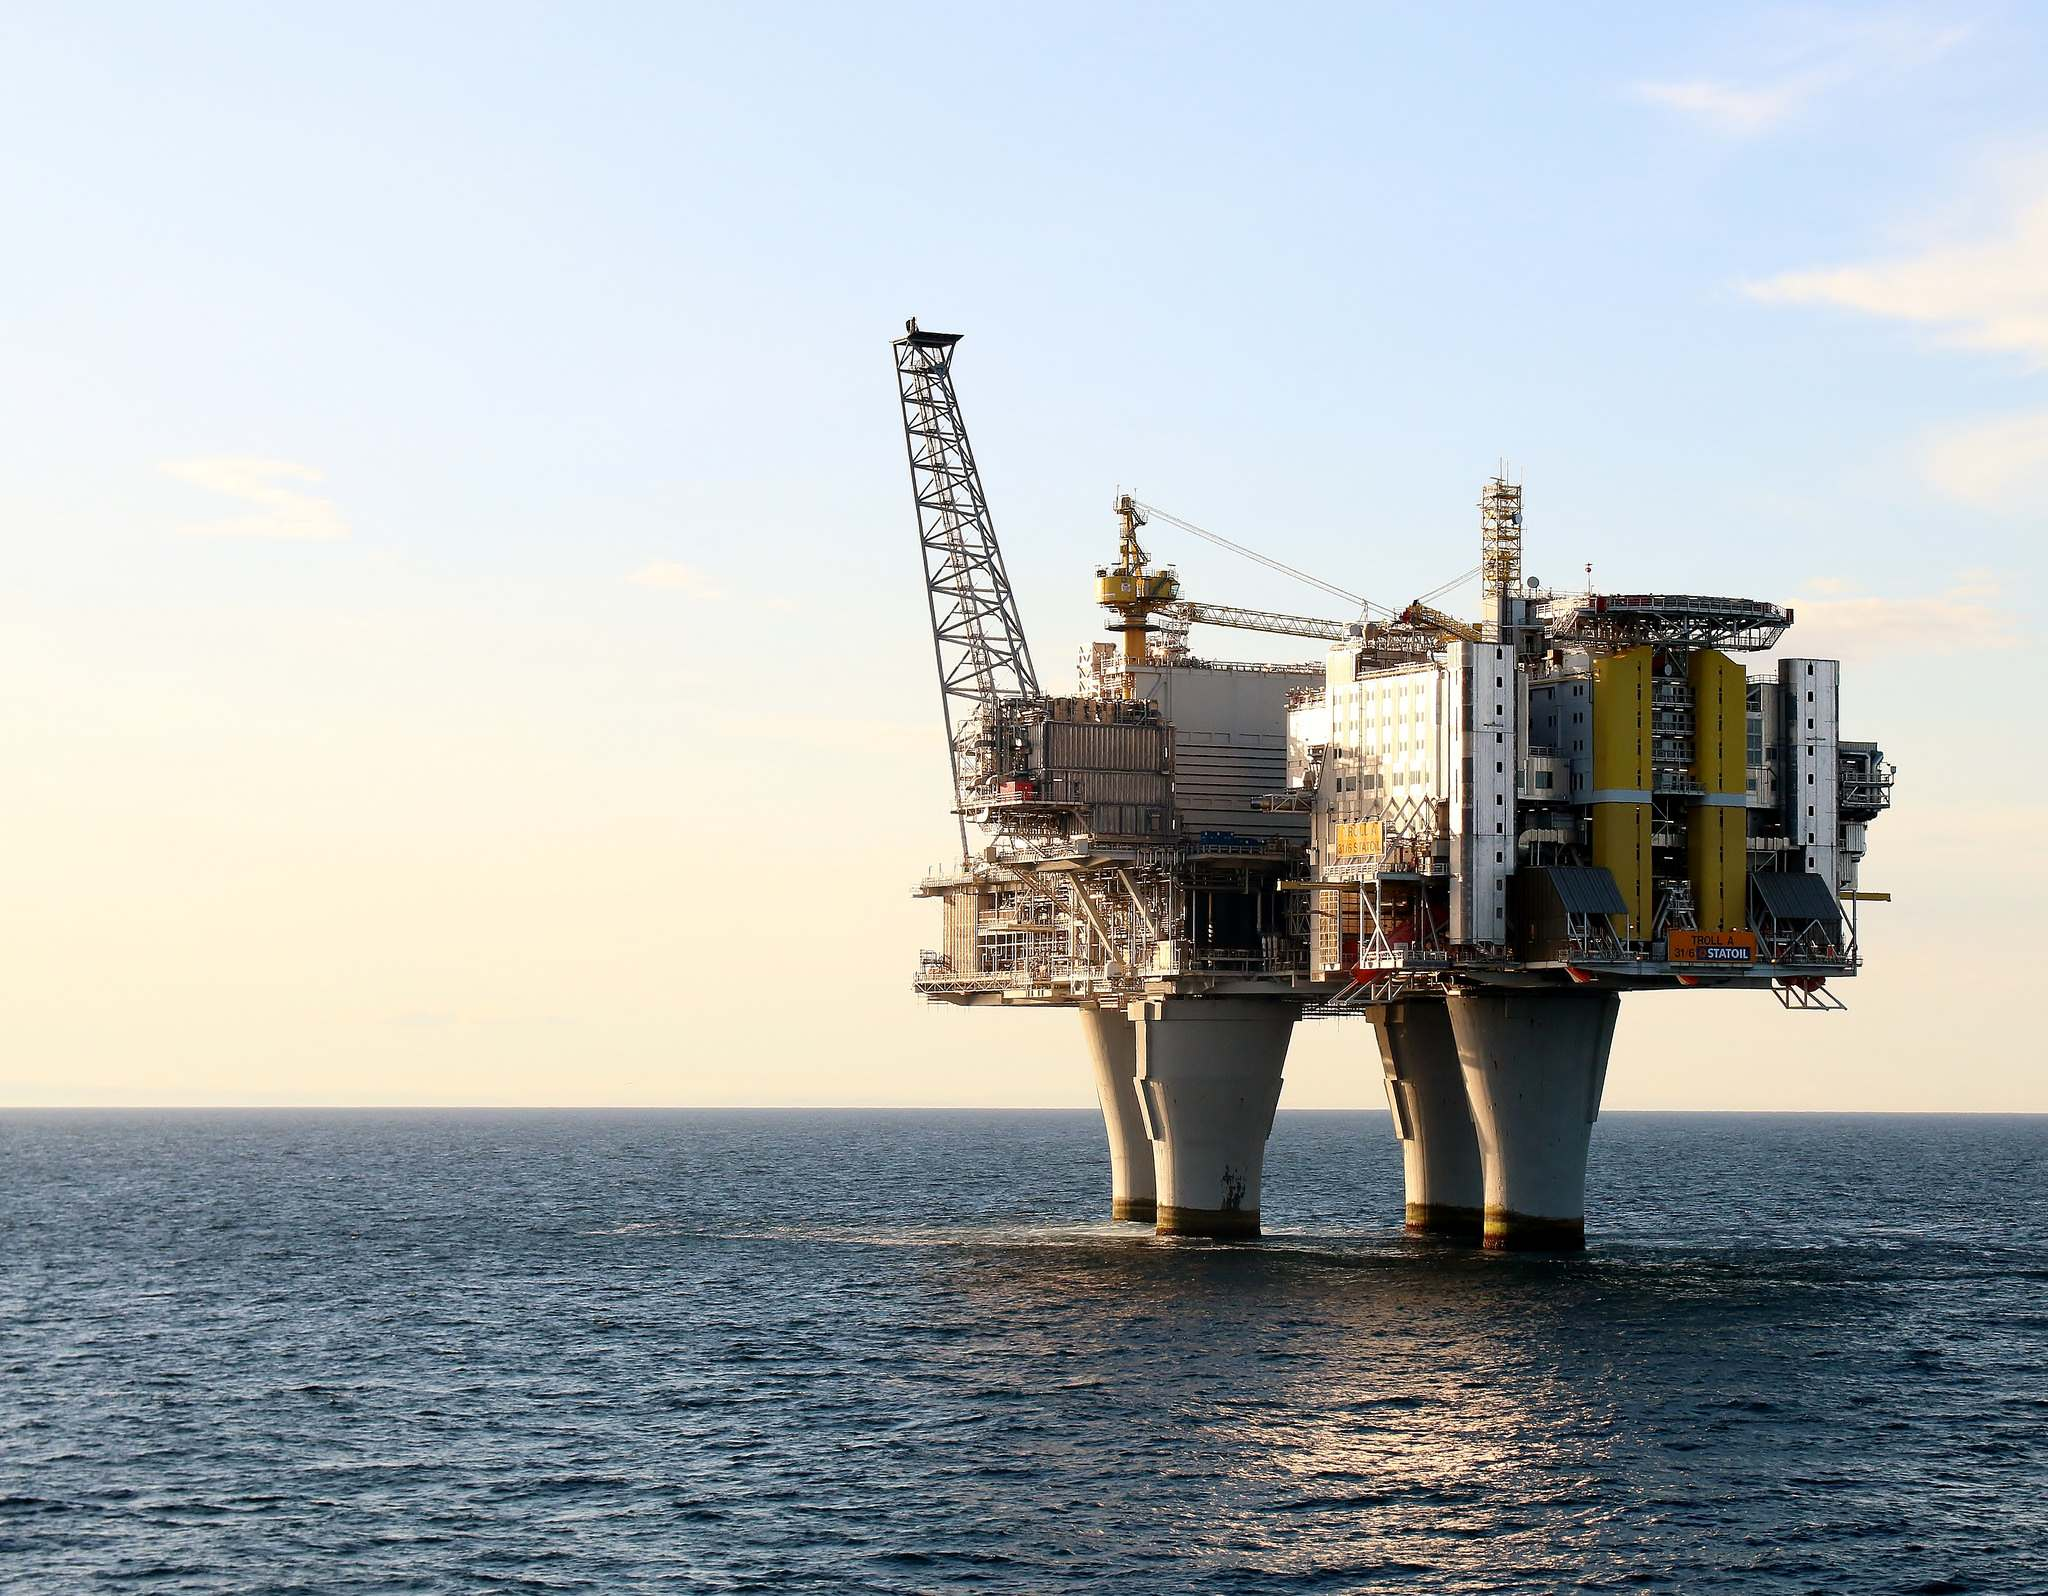 troll a Megastructure   Troll A Gas Platform, Norway